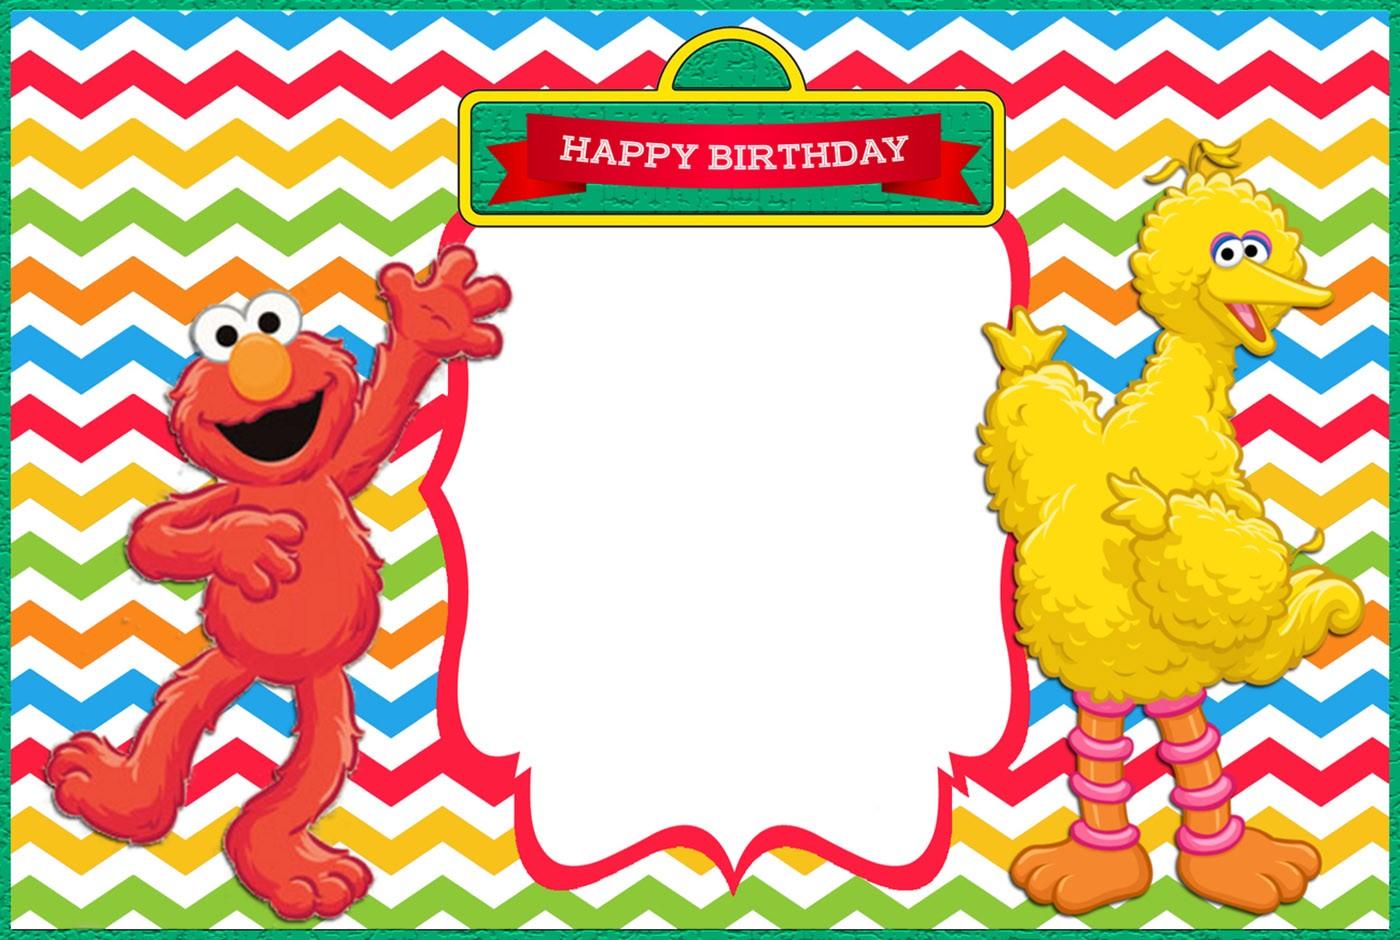 Free Printable Elmo Birthday Invitation Template | Invitations Online